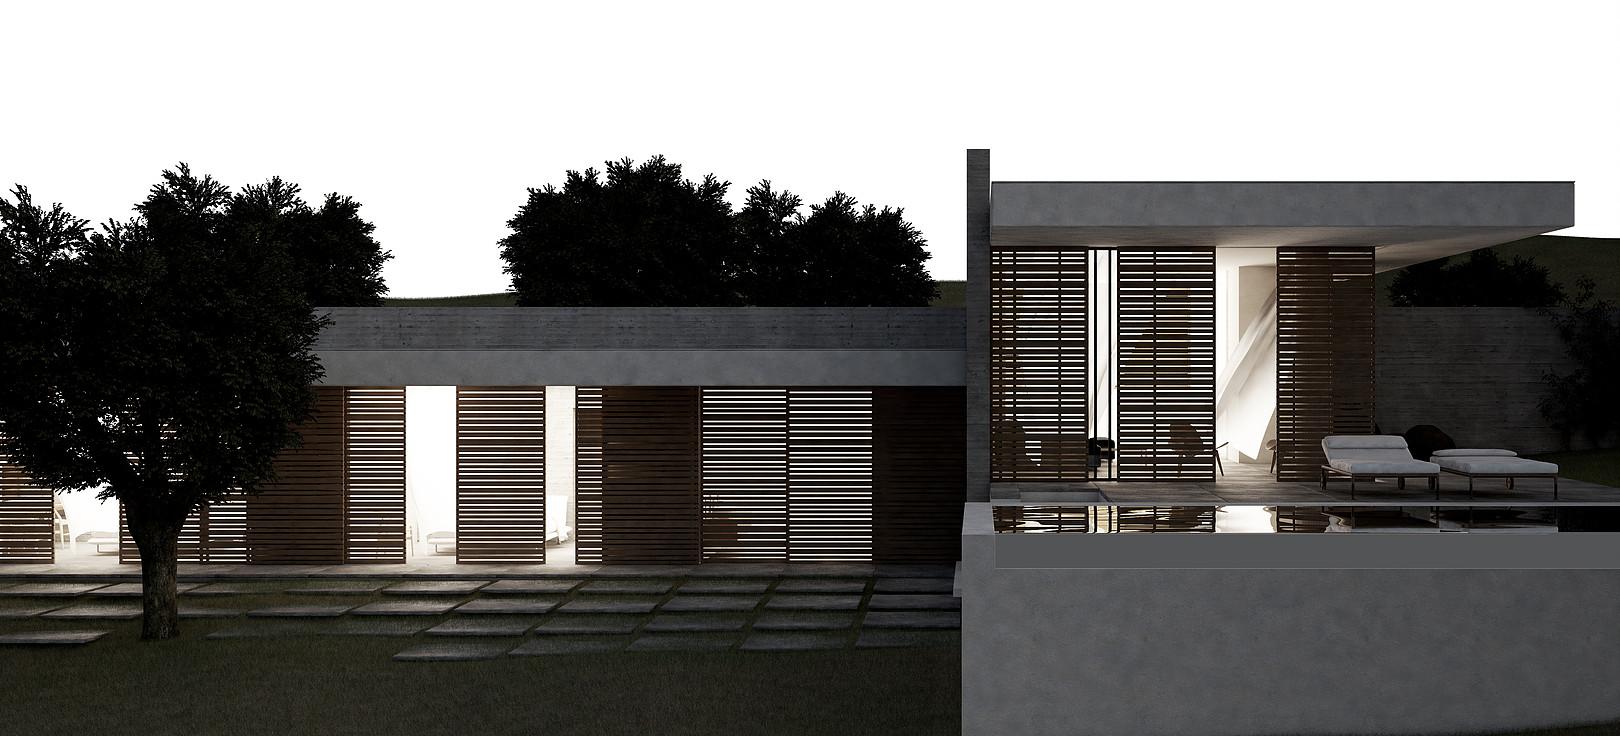 alkiviadis pyliotis architecture portfolio